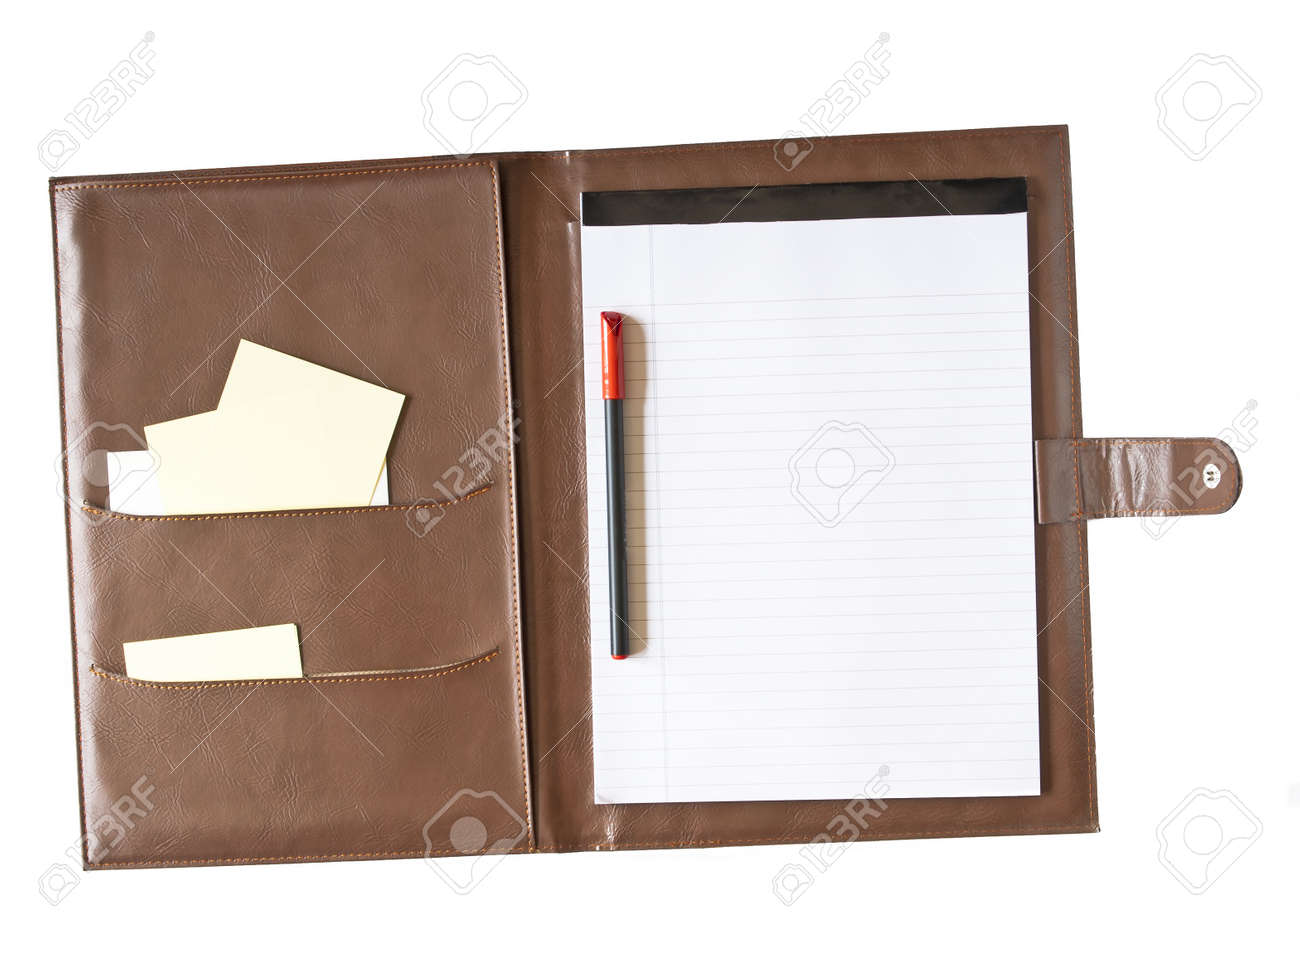 leather case notebook isolated on white background Stock Photo - 16515024